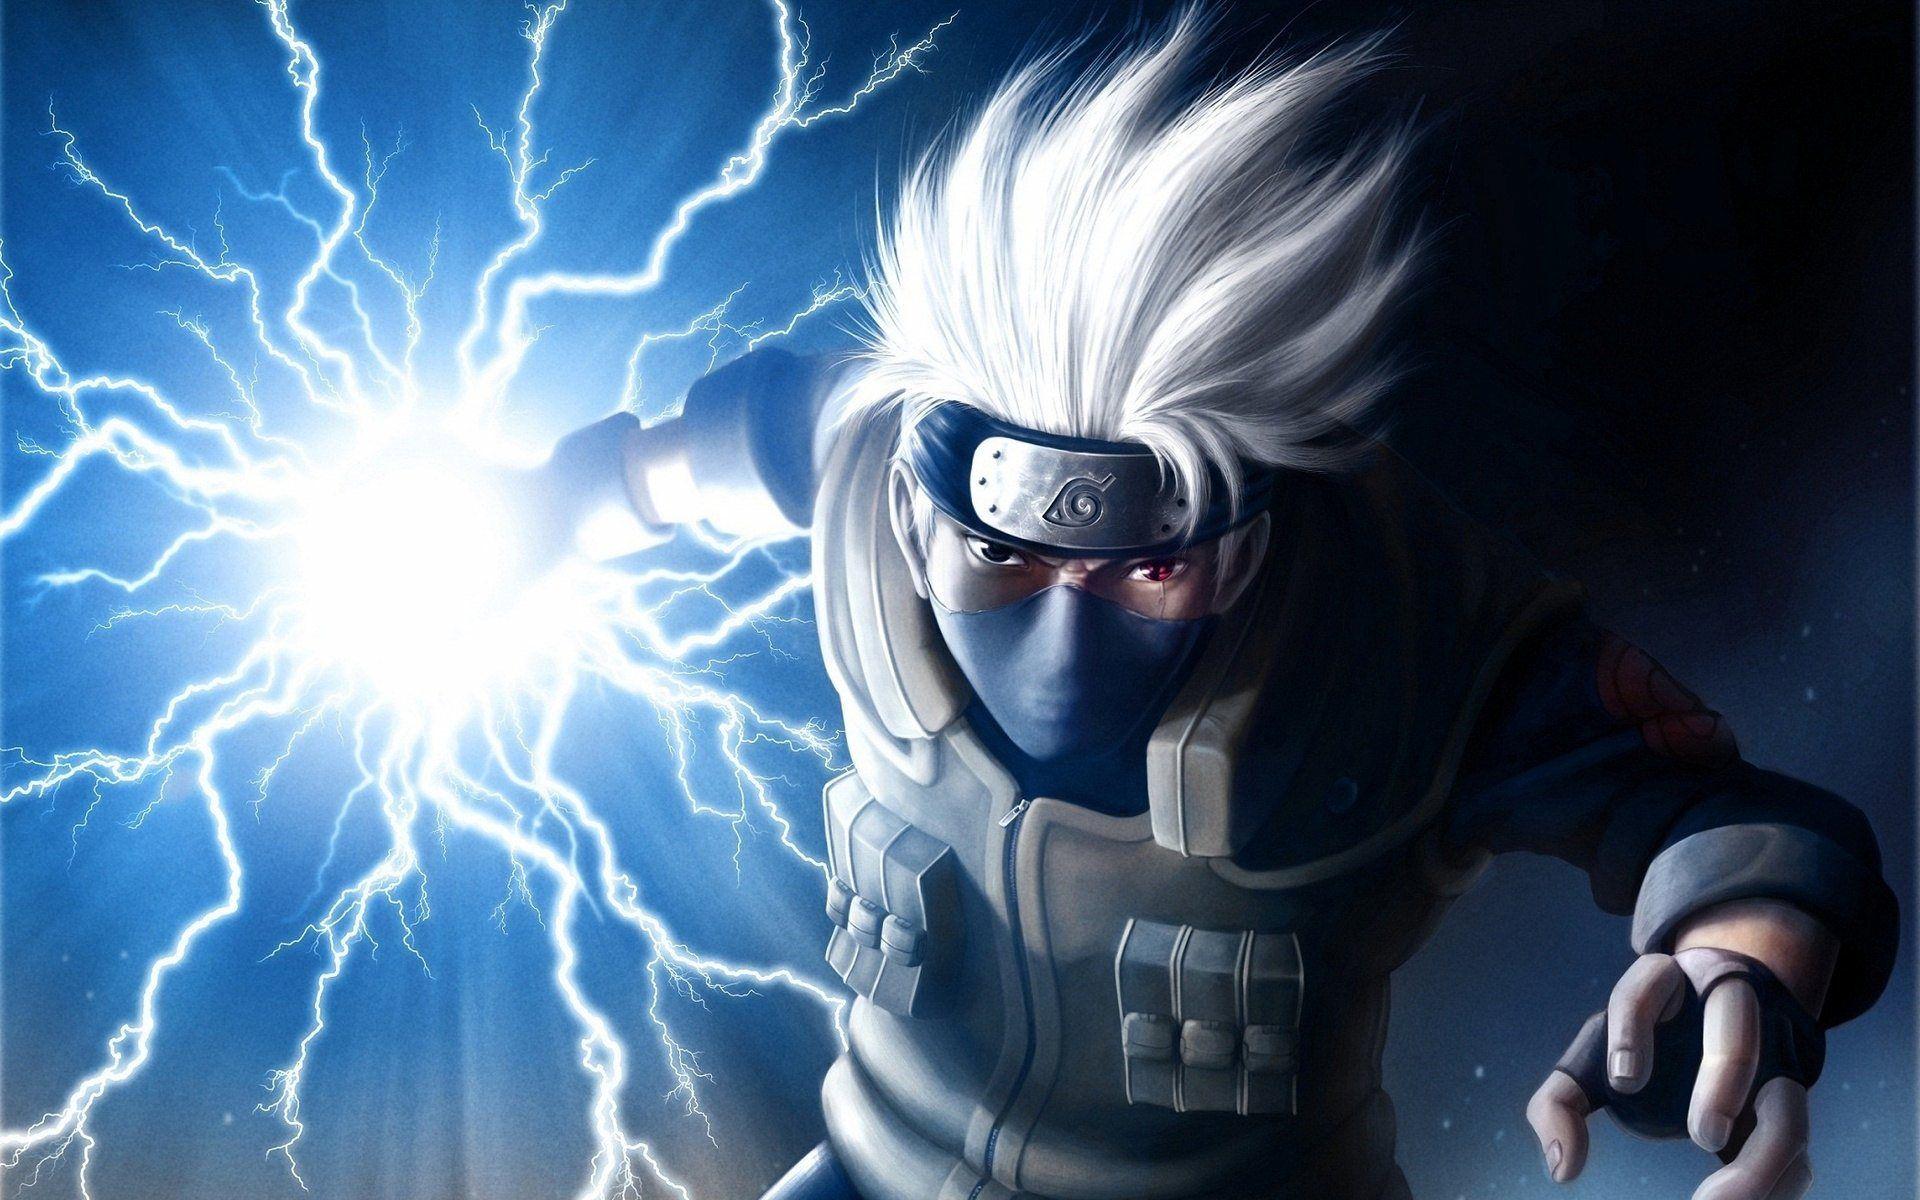 Naruto Shippuden Backgrounds 036